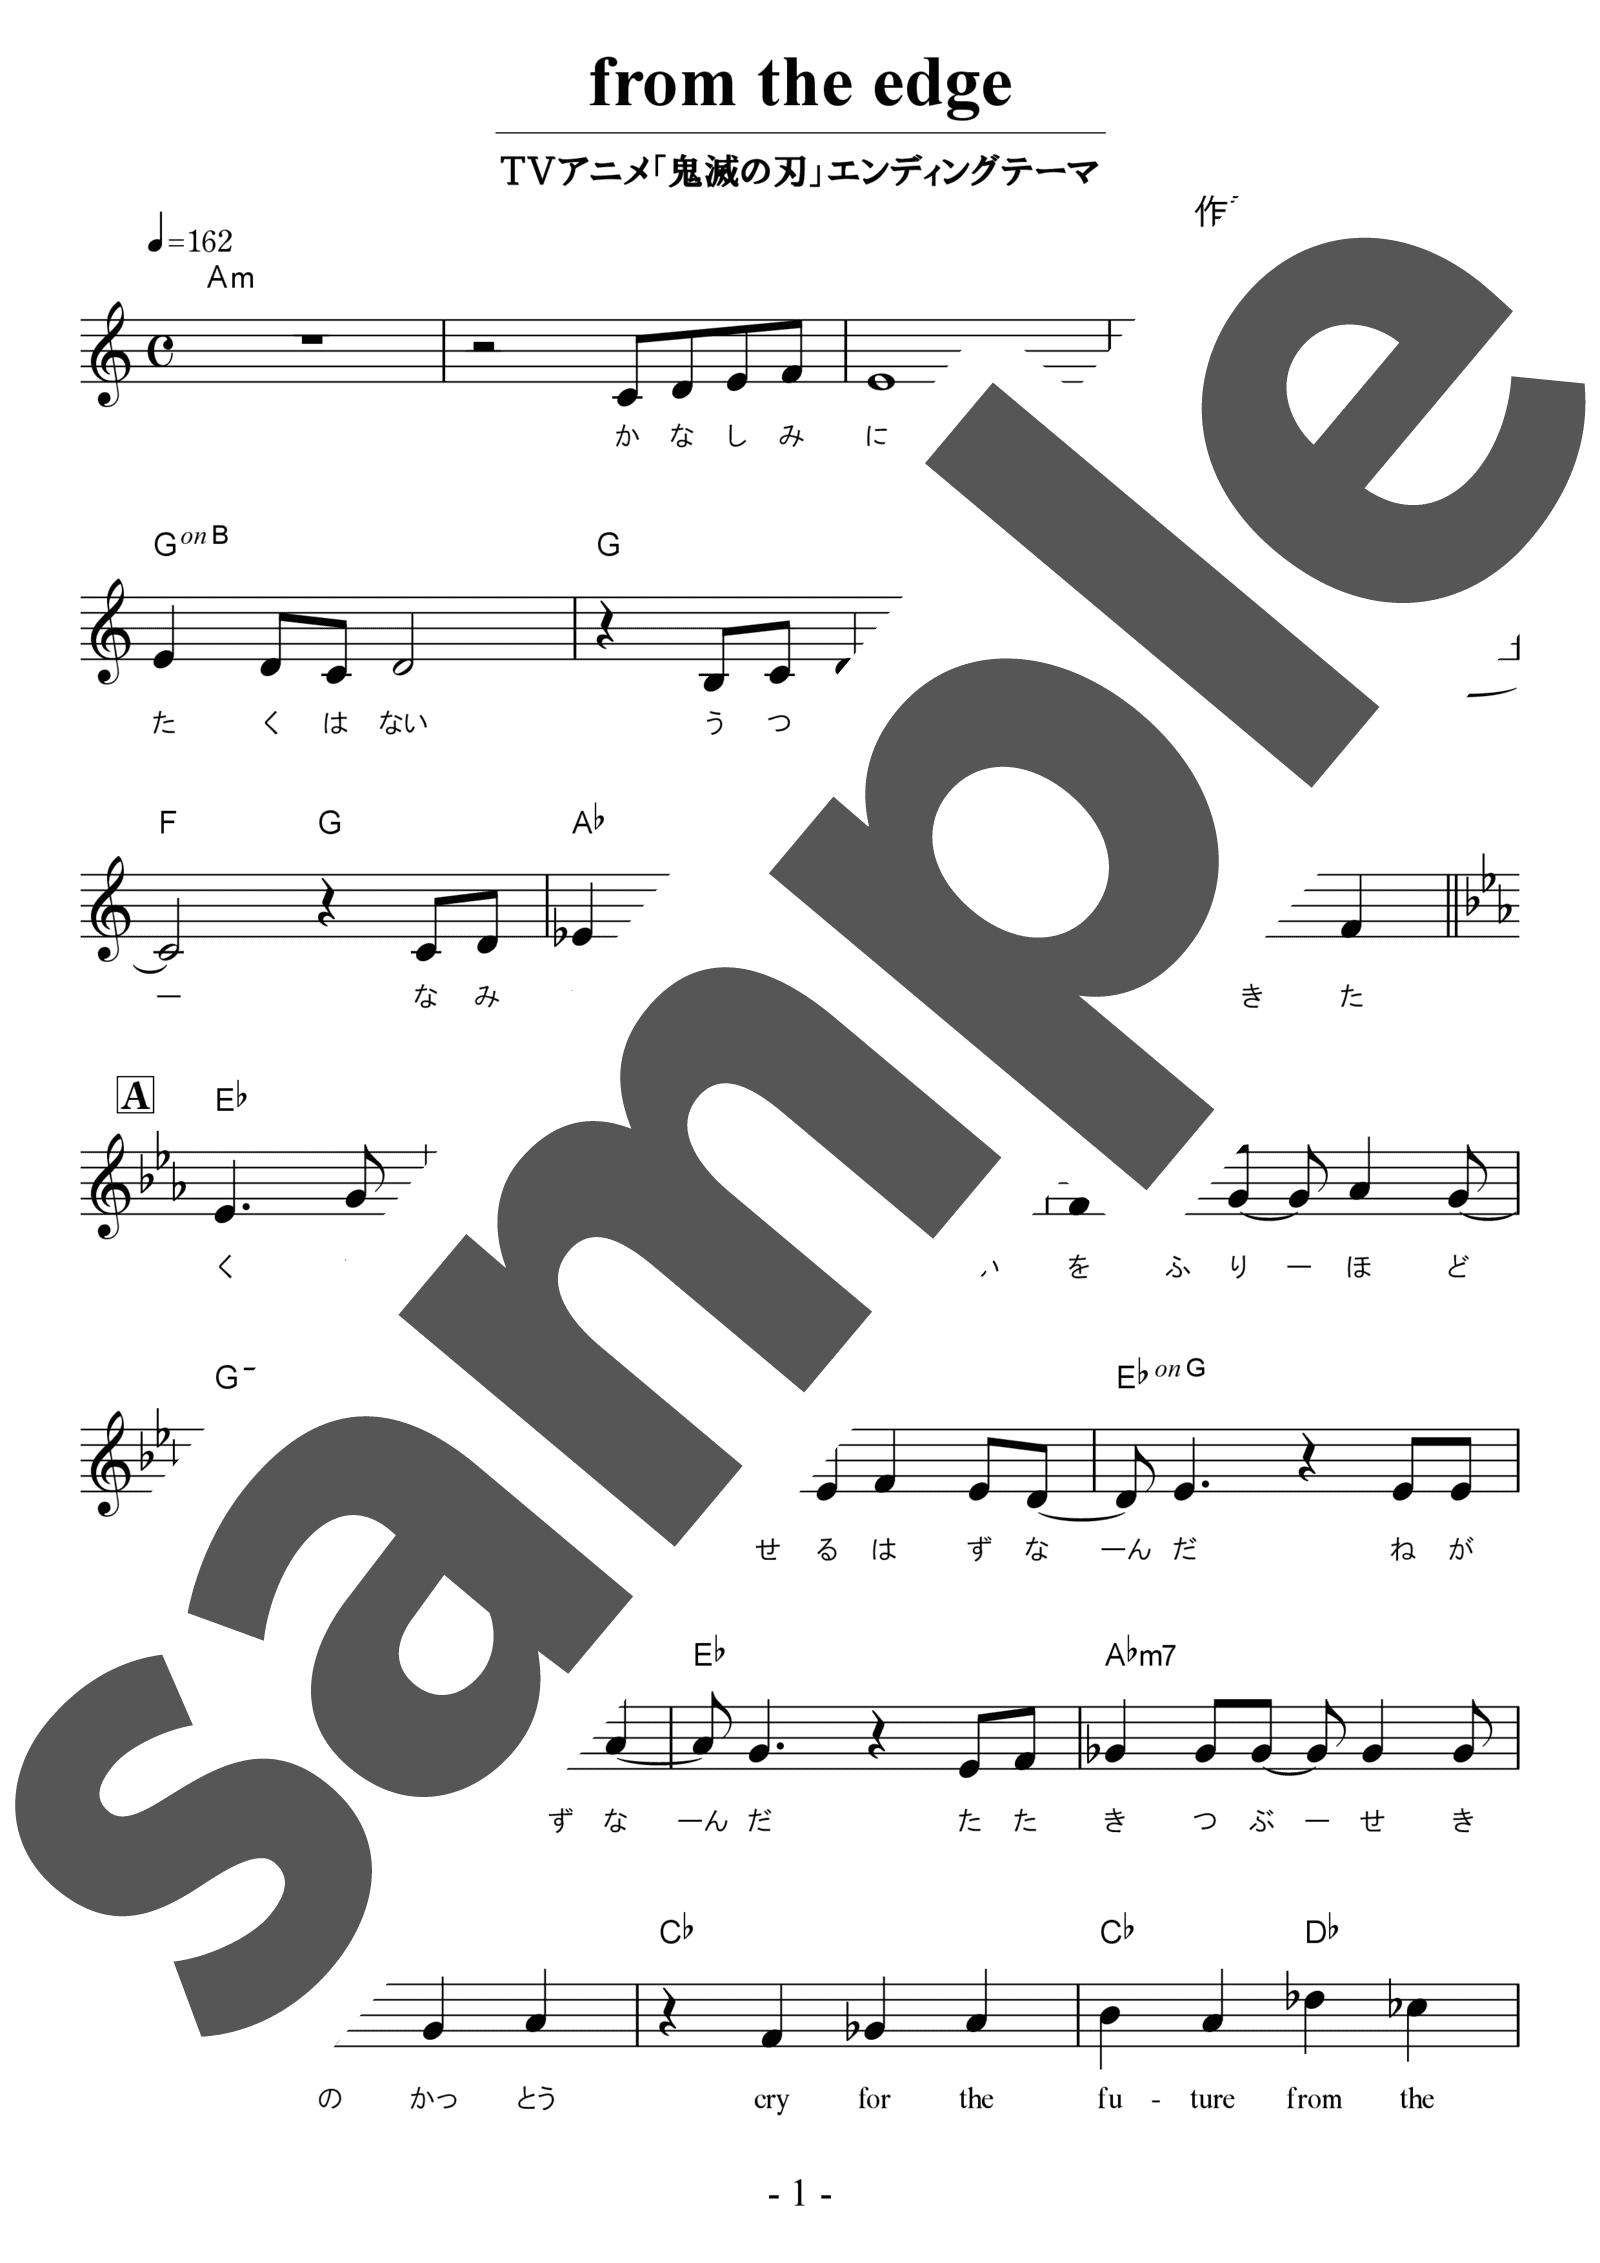 「from the edge」のサンプル楽譜